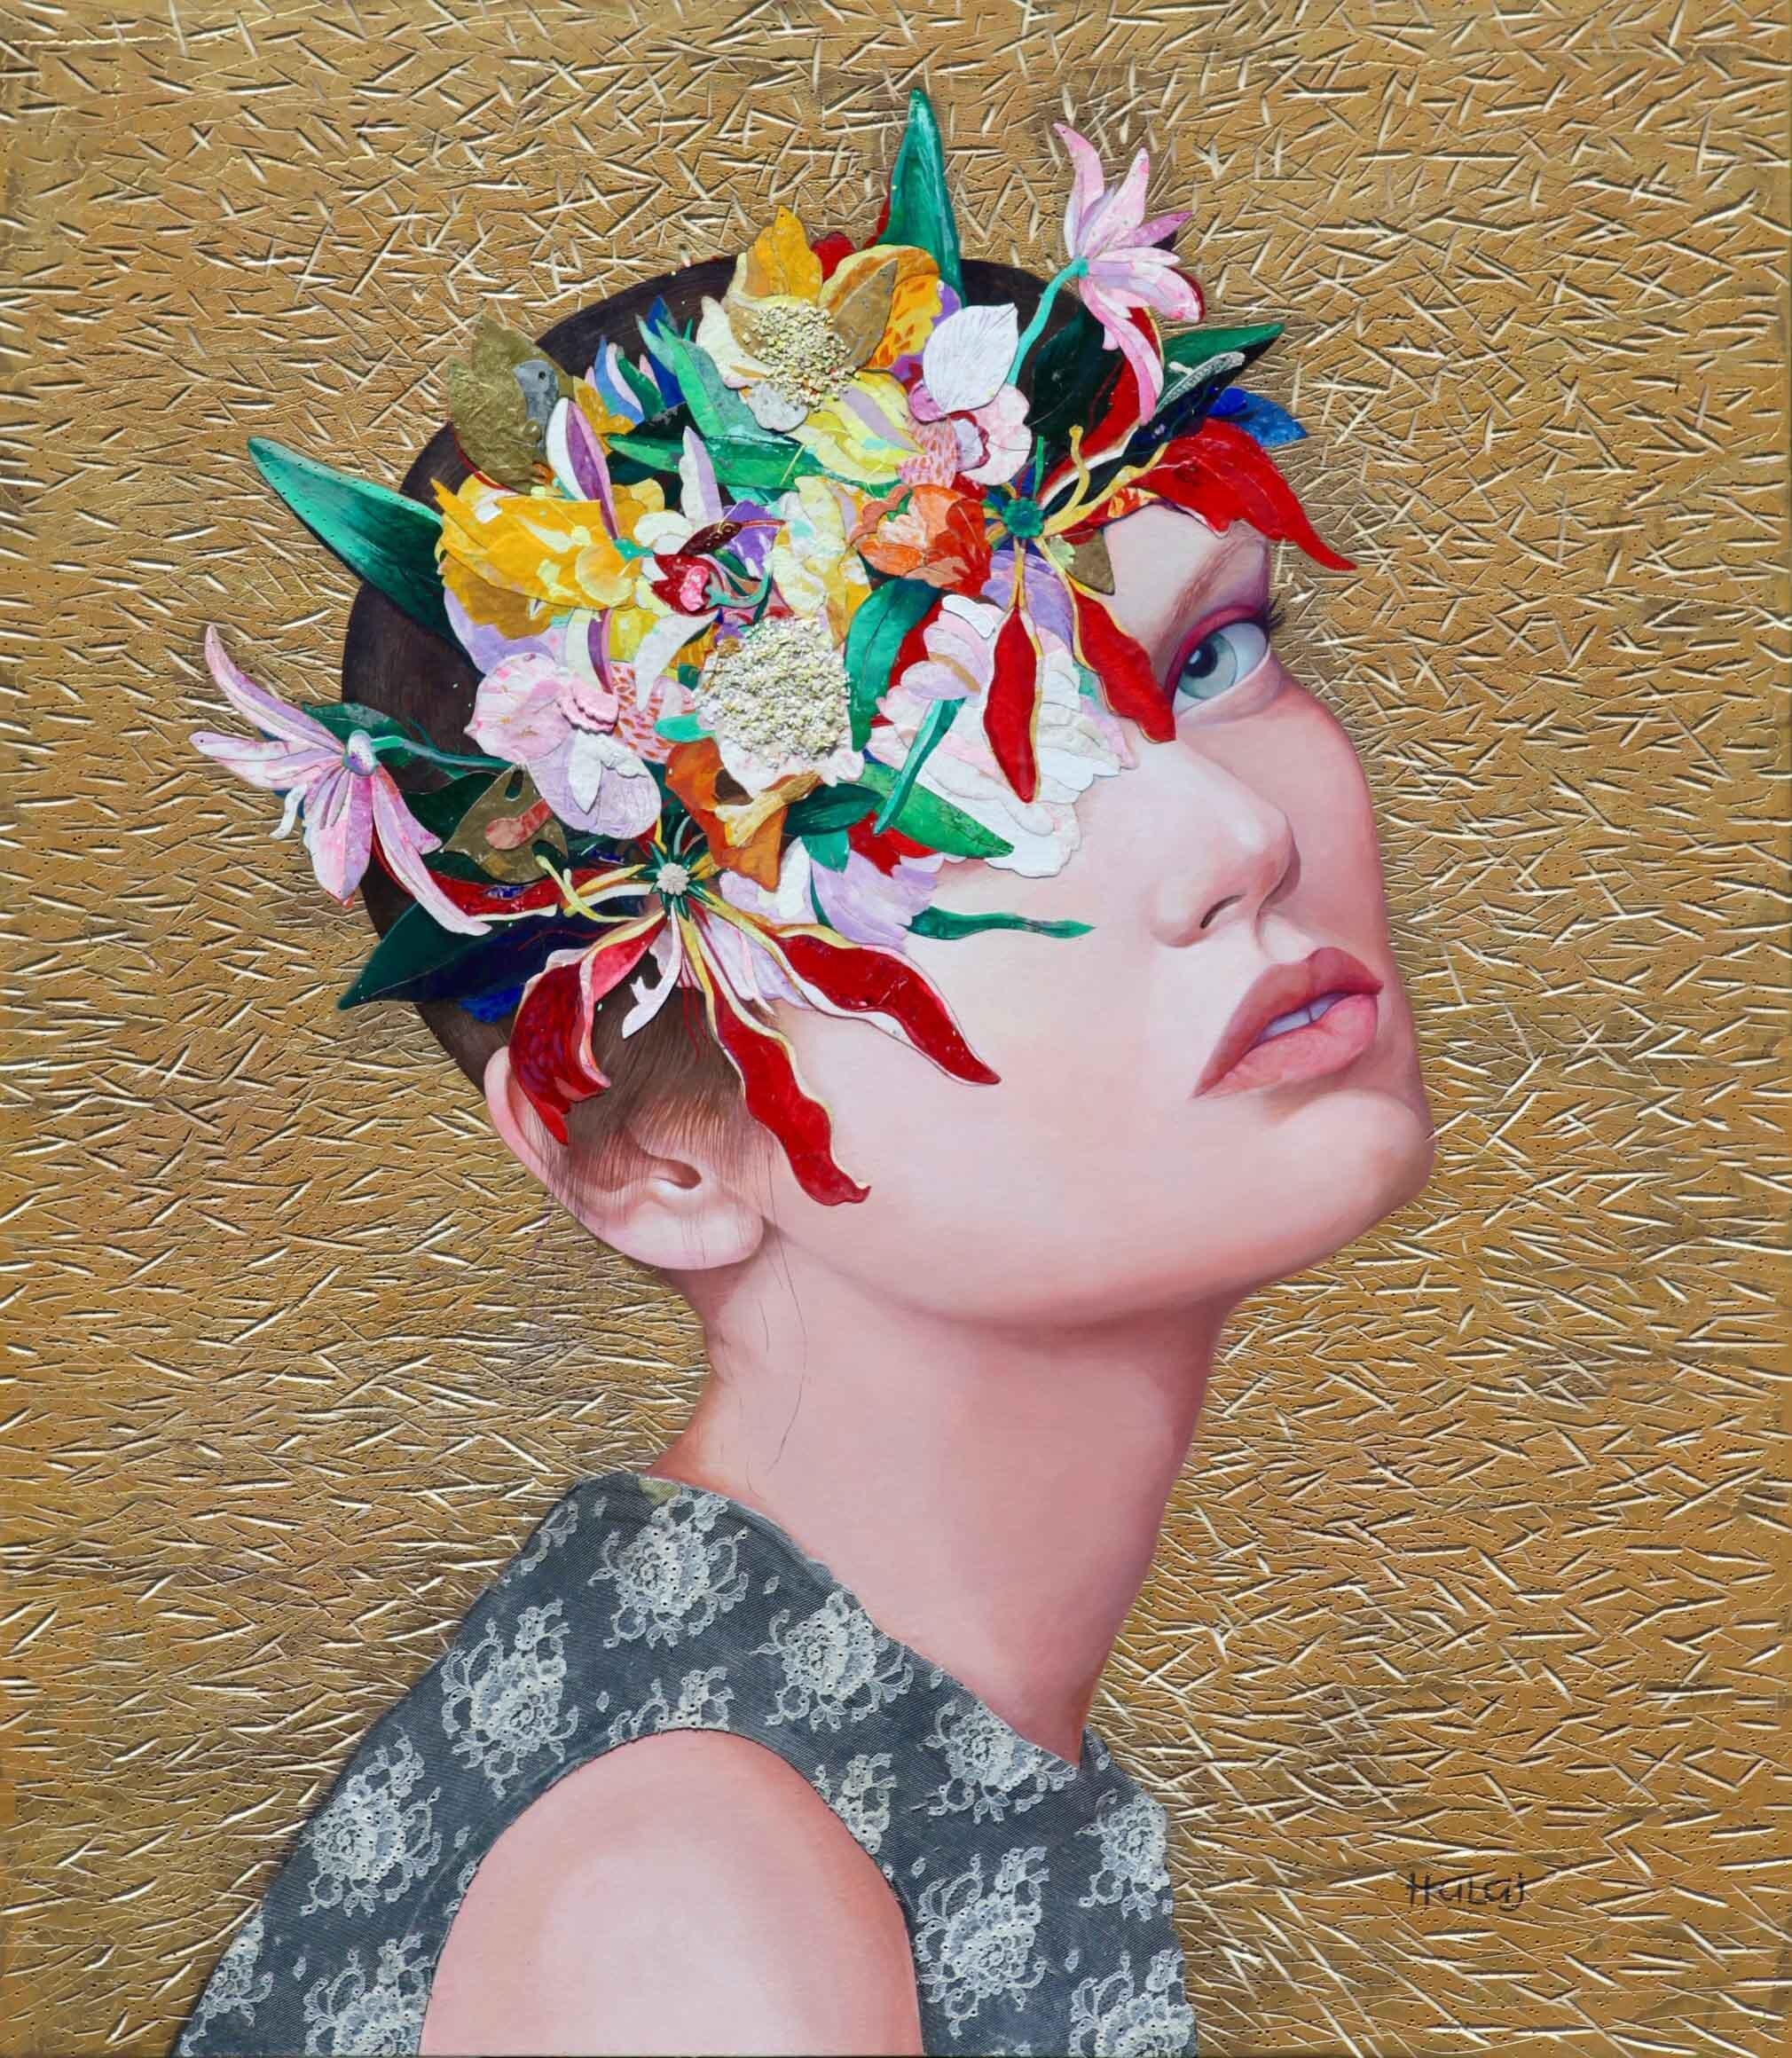 "Minas Halaj "" Floral Mind # 52 "" 2019, oil , mixed media on panel, 46x40 inches ( 116.84x101.6 cm.).jpg"